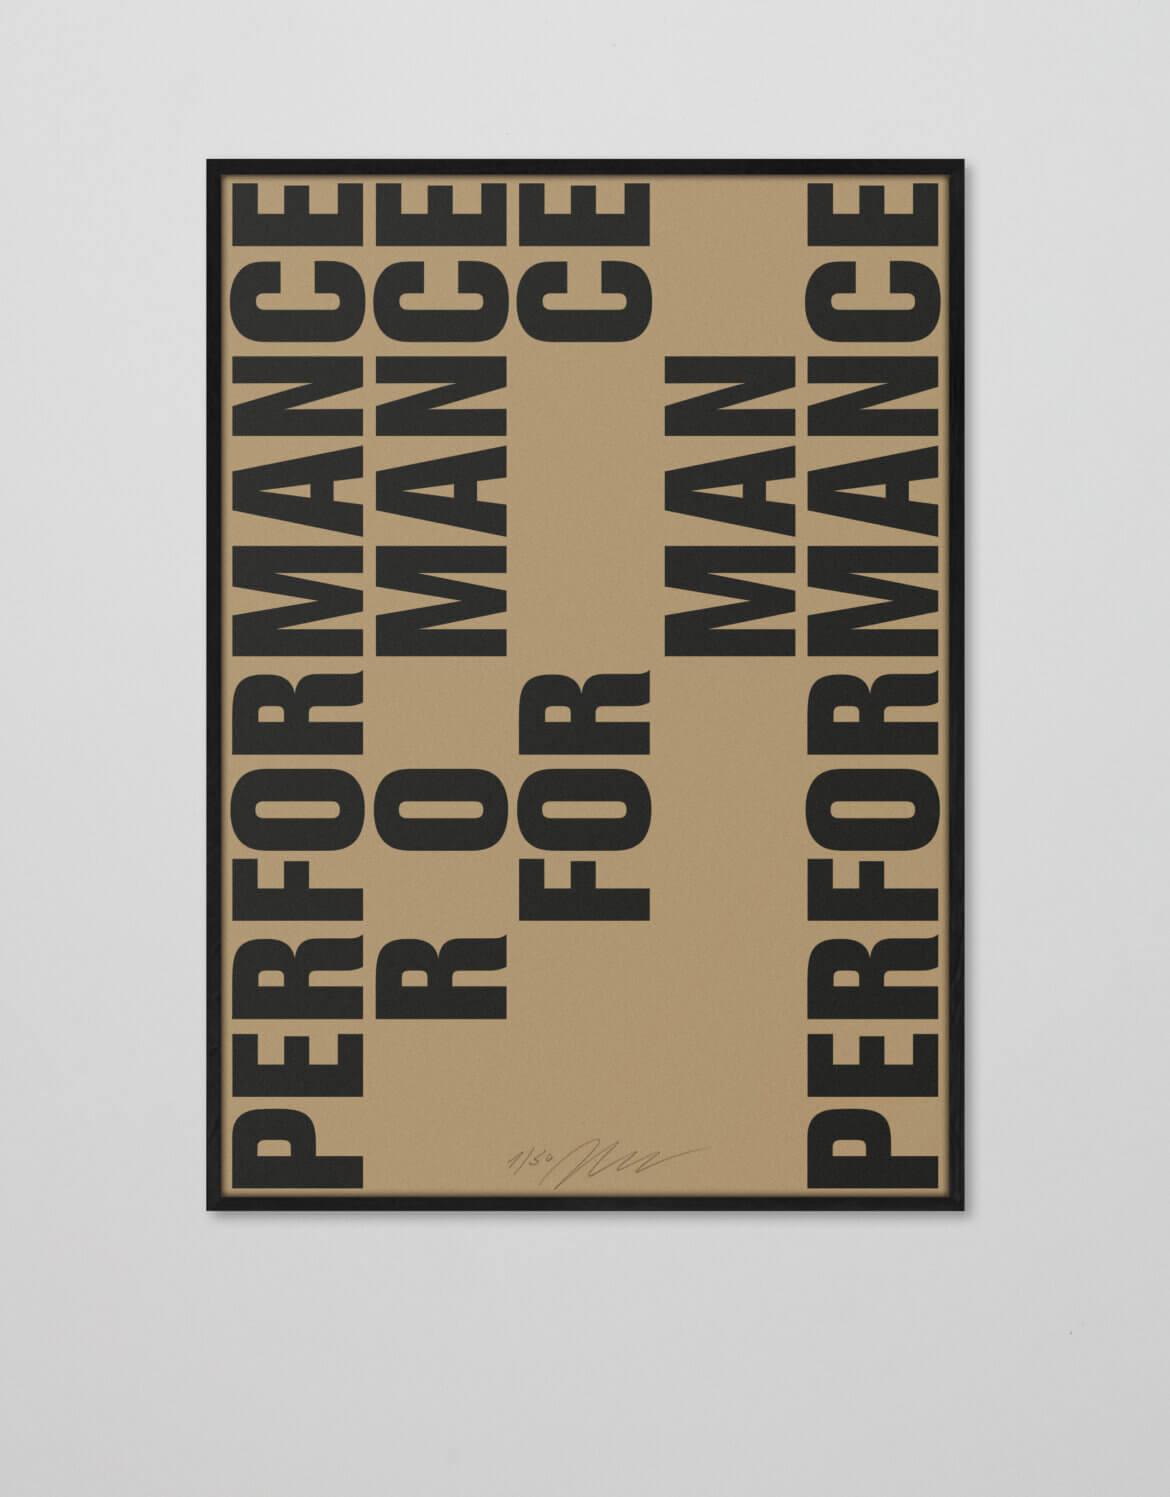 Rahmen | Poster |Pantone | Theater |Schrift